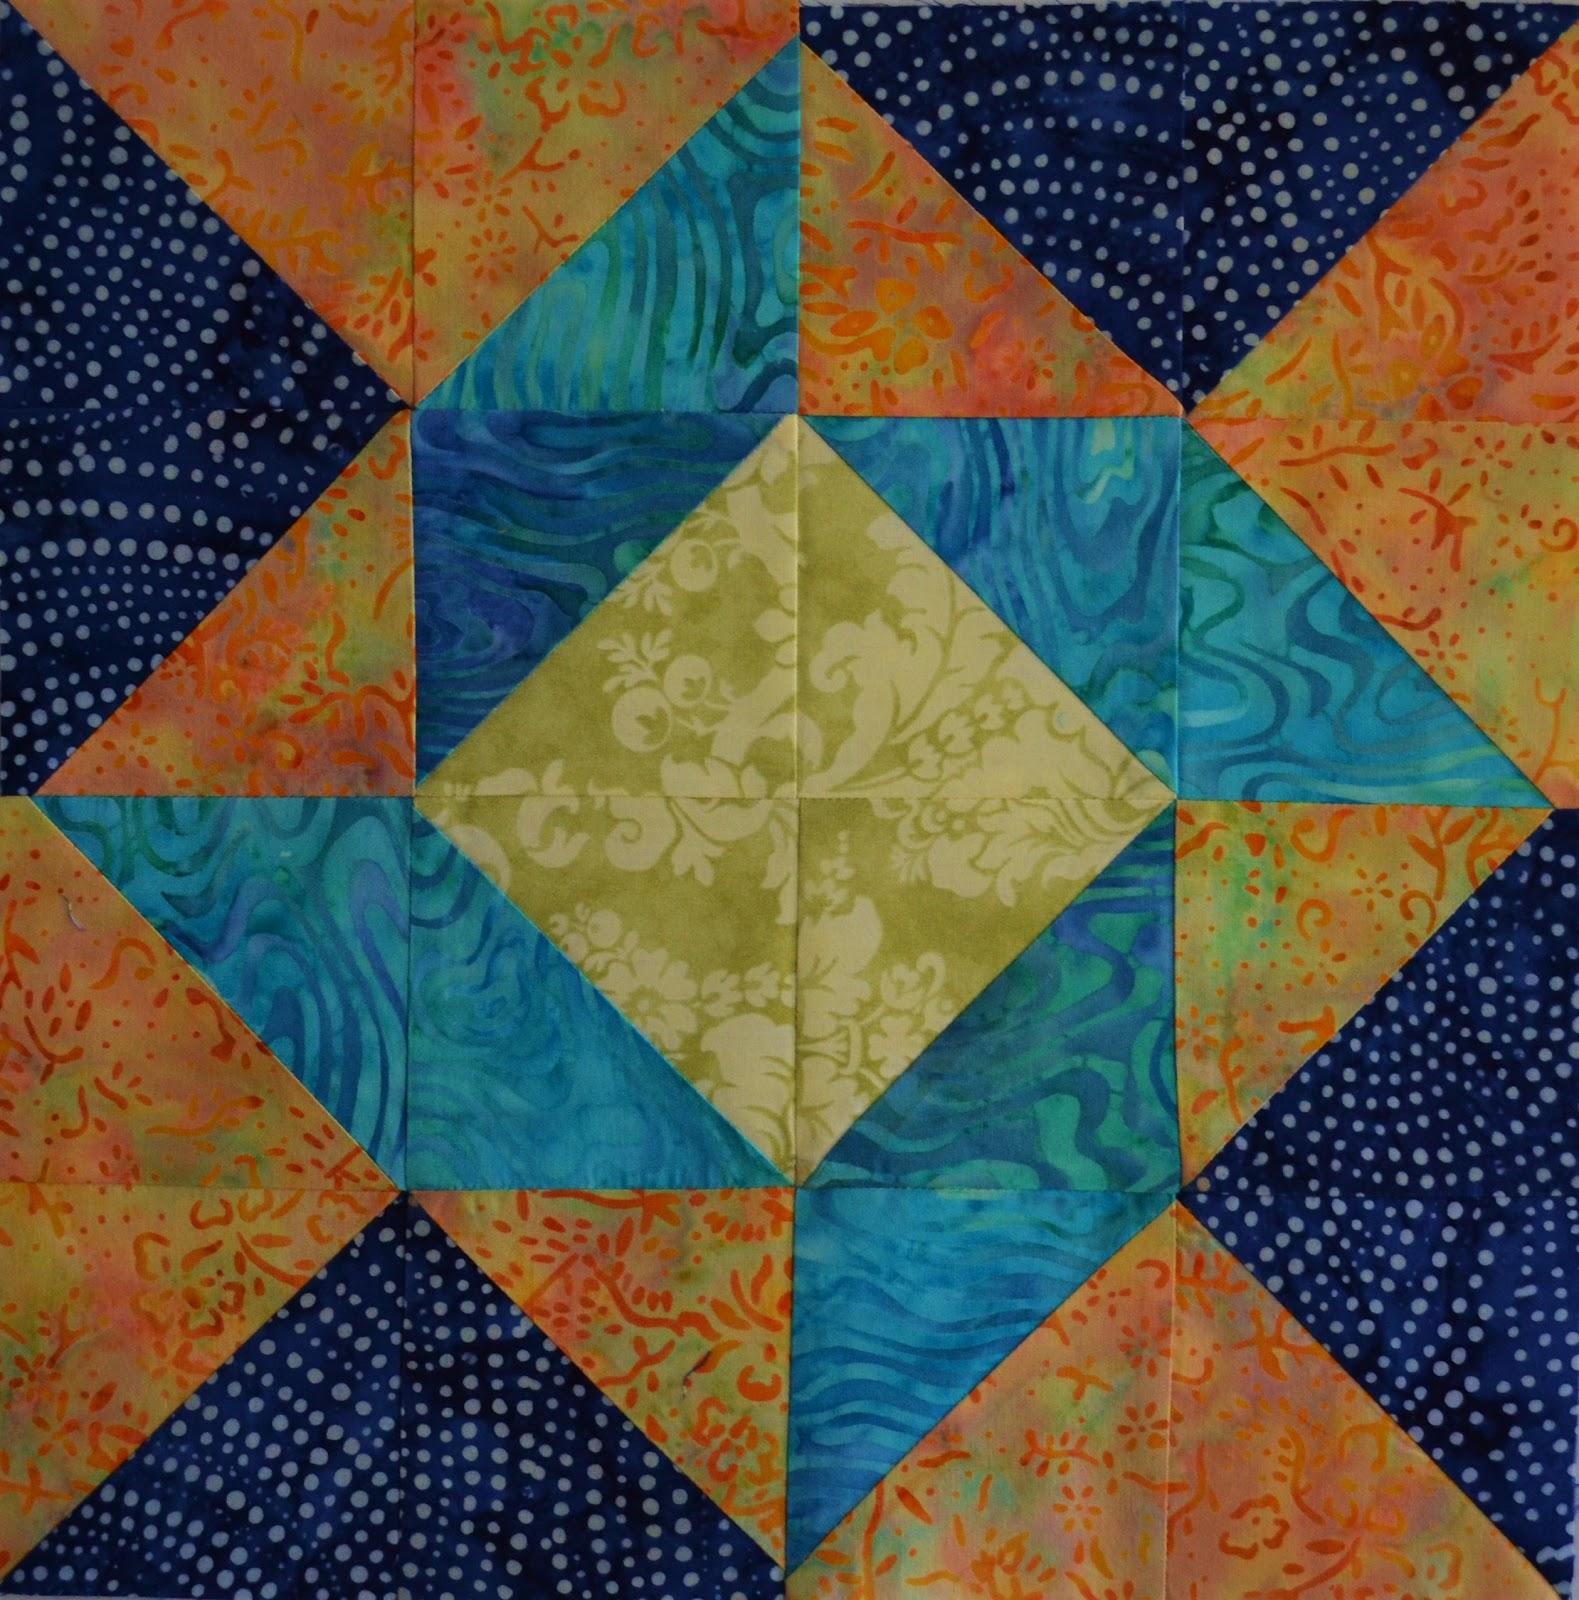 Quilting Designs For Blocks : Chock-A-Block Quilt Blocks: Balkan Puzzle